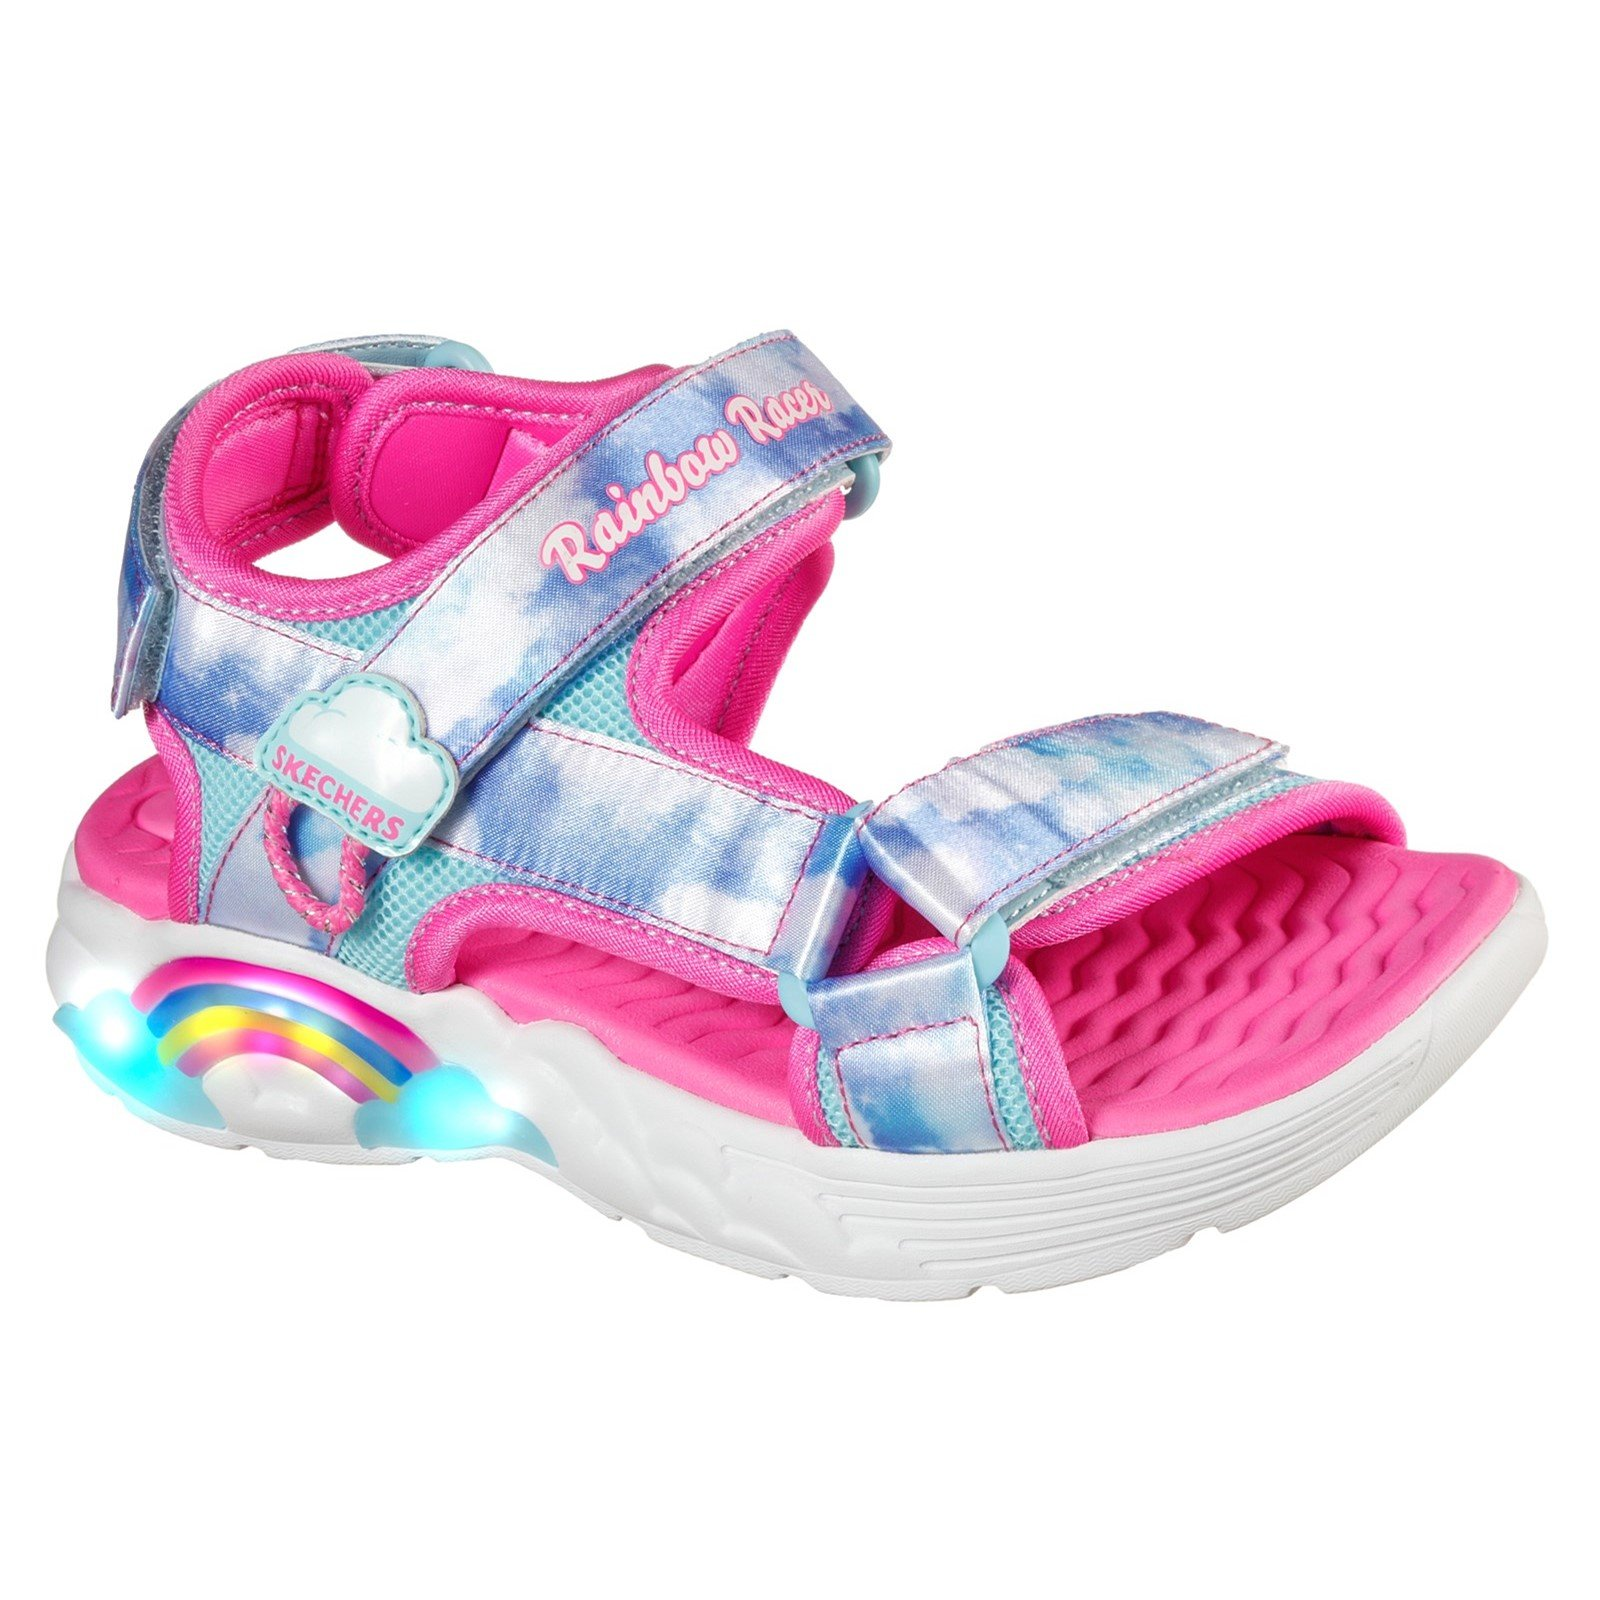 Skechers Unisex Rainbow Racer Summer Sky Beach Sandals Multicolor 32096 - Pink/Blue Textile 12.5